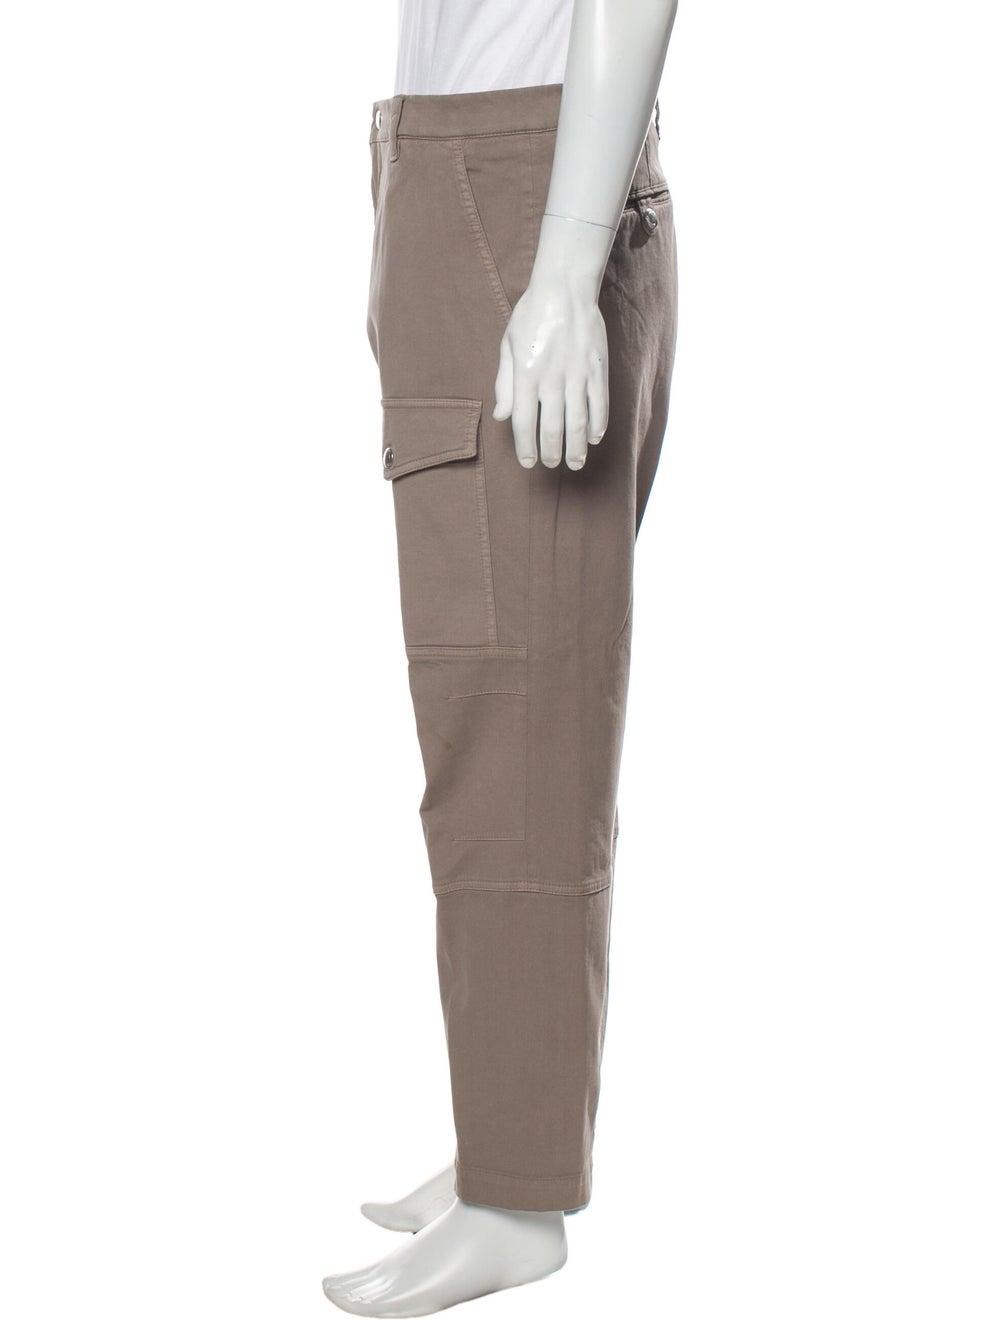 Brunello Cucinelli Cargo Pants - image 2